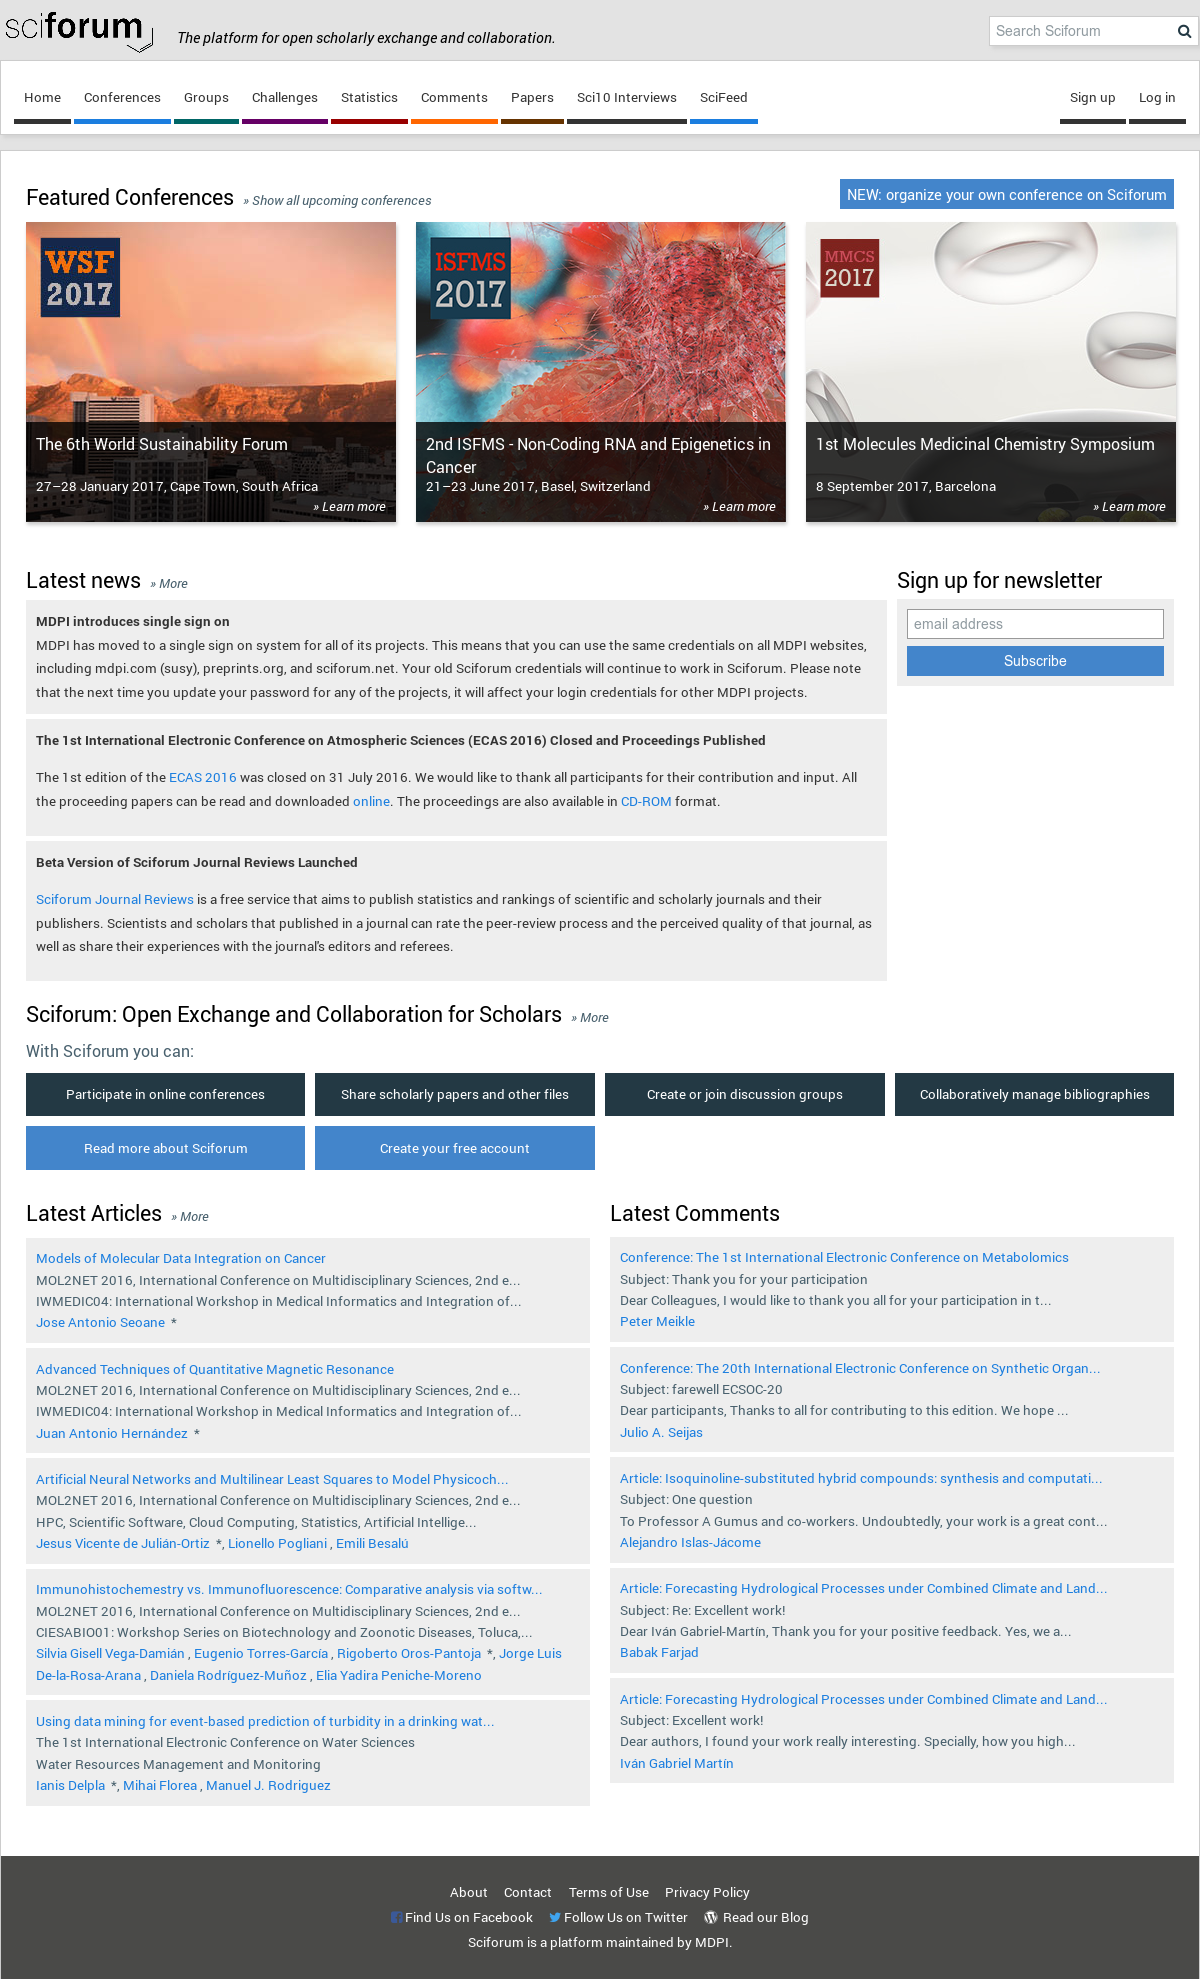 Sciforum Competitors, Revenue and Employees - Owler Company